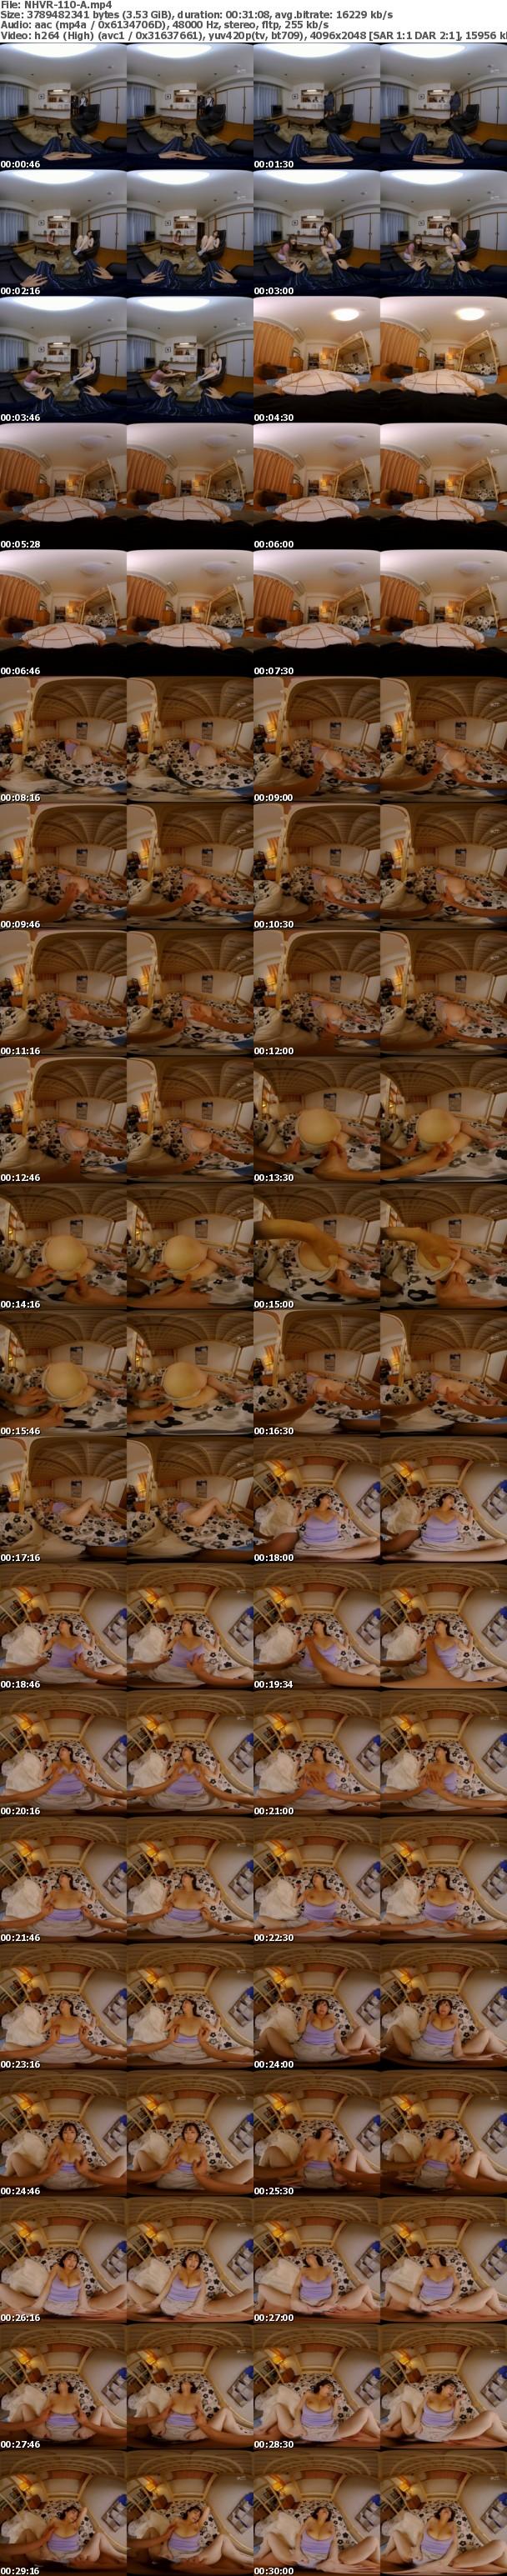 (VR) NHVR-110 2段ベッドで…姉とセックス中に「後ろ!後ろ!」妹に覗き見されて興奮倍増!姉のベロキス騎乗位と妹の種搾りプレスで圧倒的に痴女られたボク